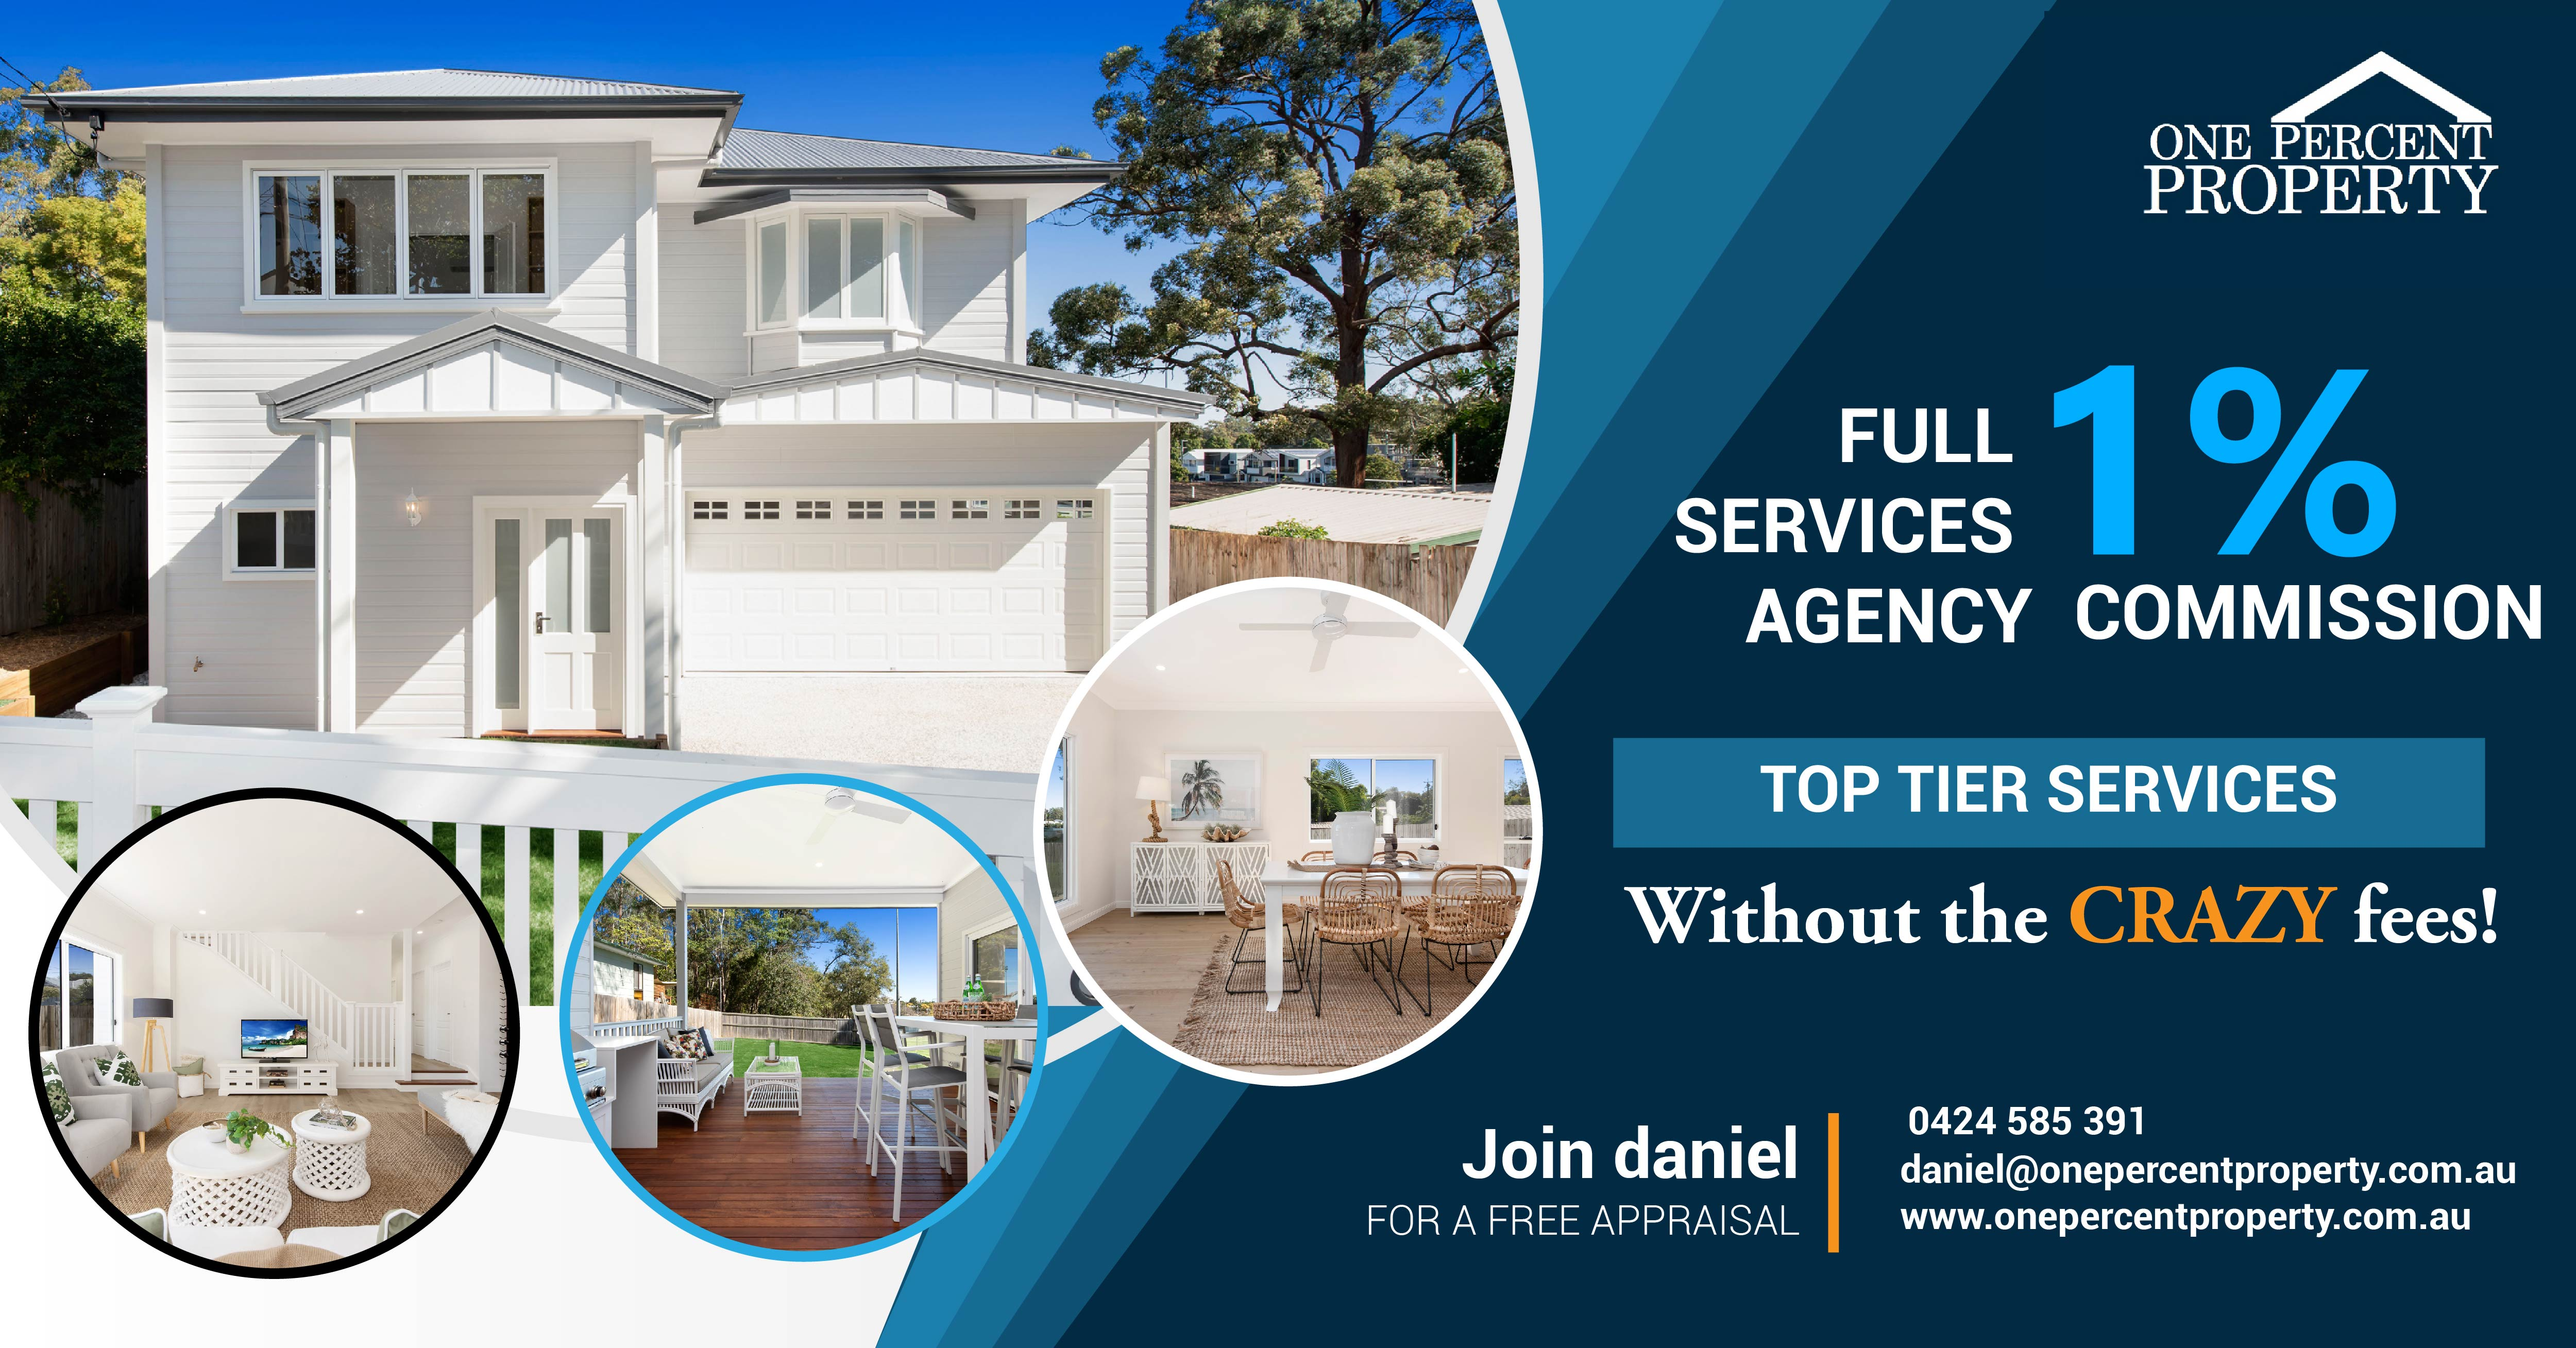 Upmarket Bold Real Estate Agent Banner Ad Design For A Company By Adje Folake Design 22501850